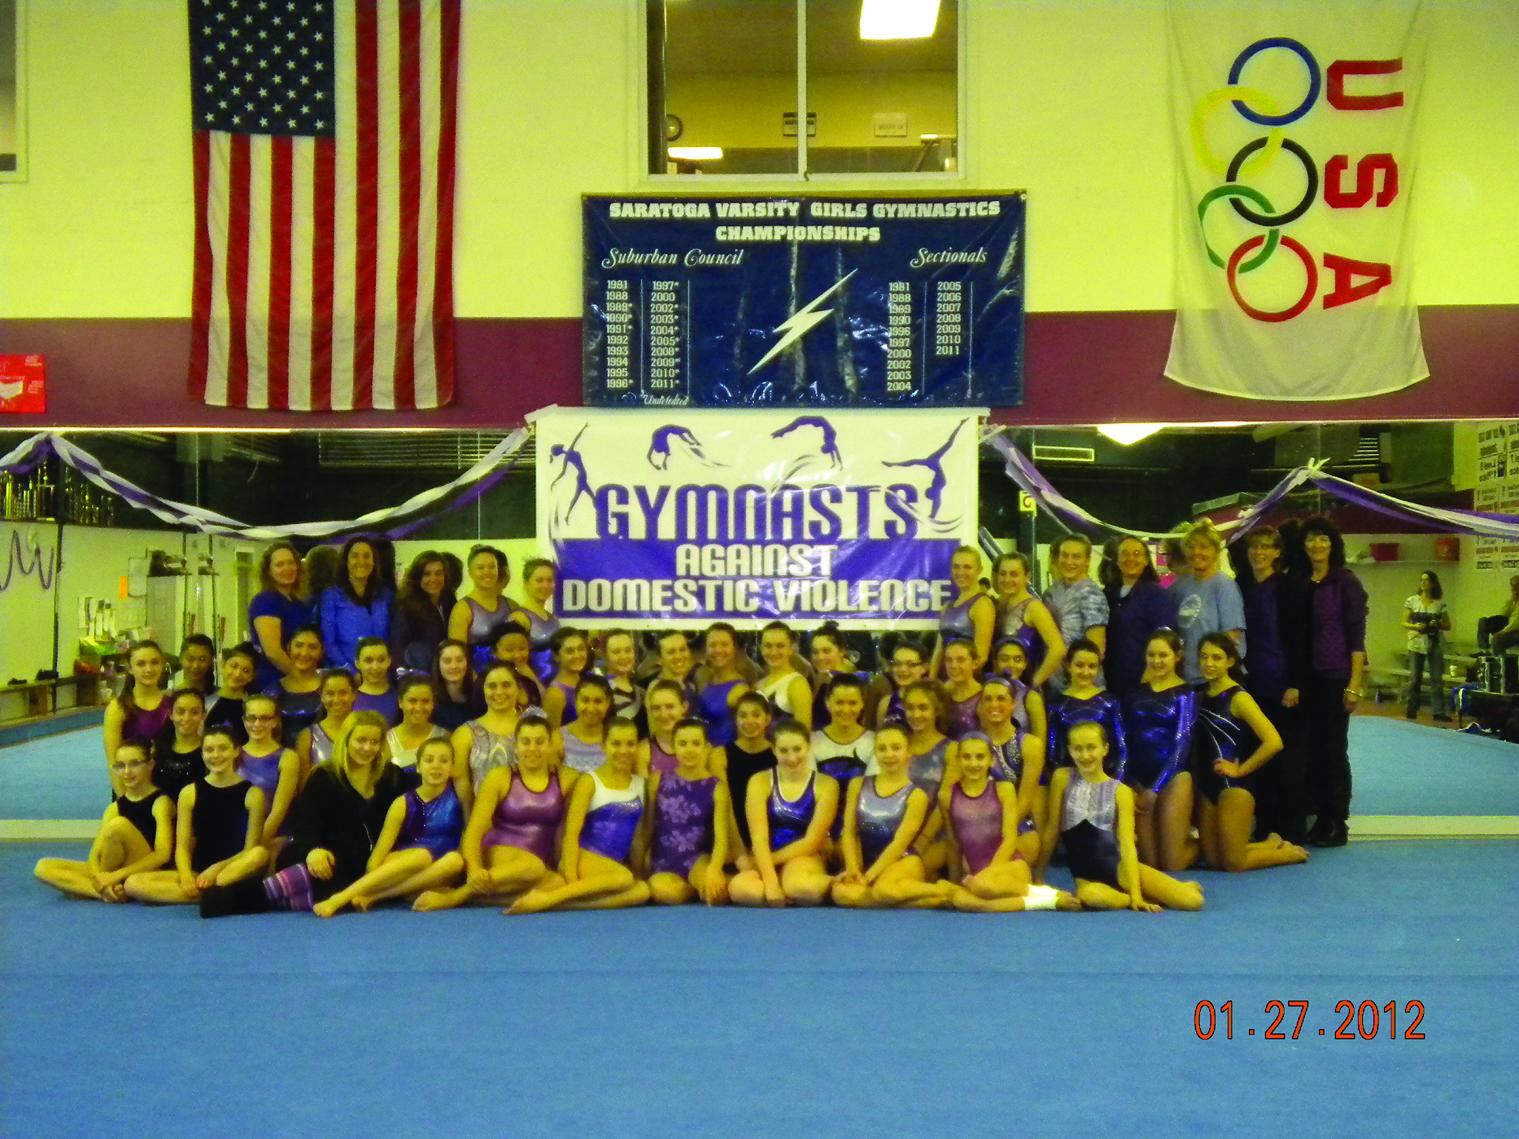 gymnasts against domestic bviolence.jpg